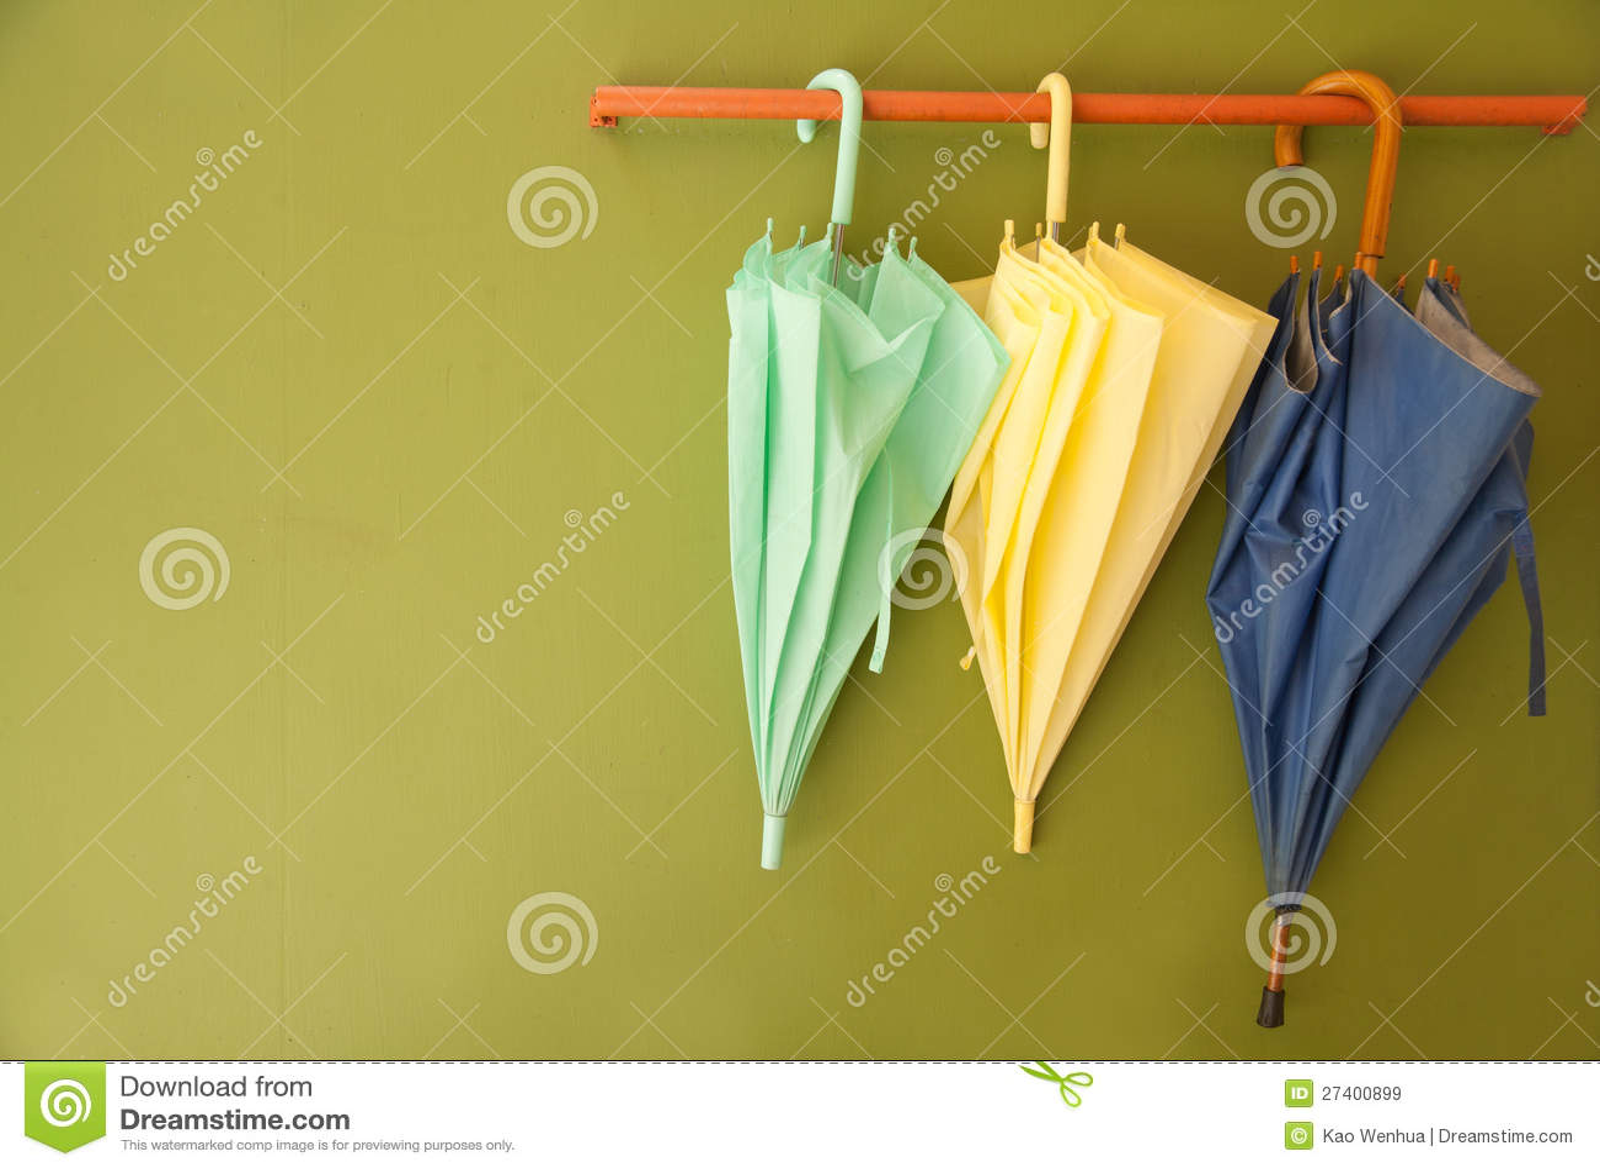 Umbrella hang on hanger